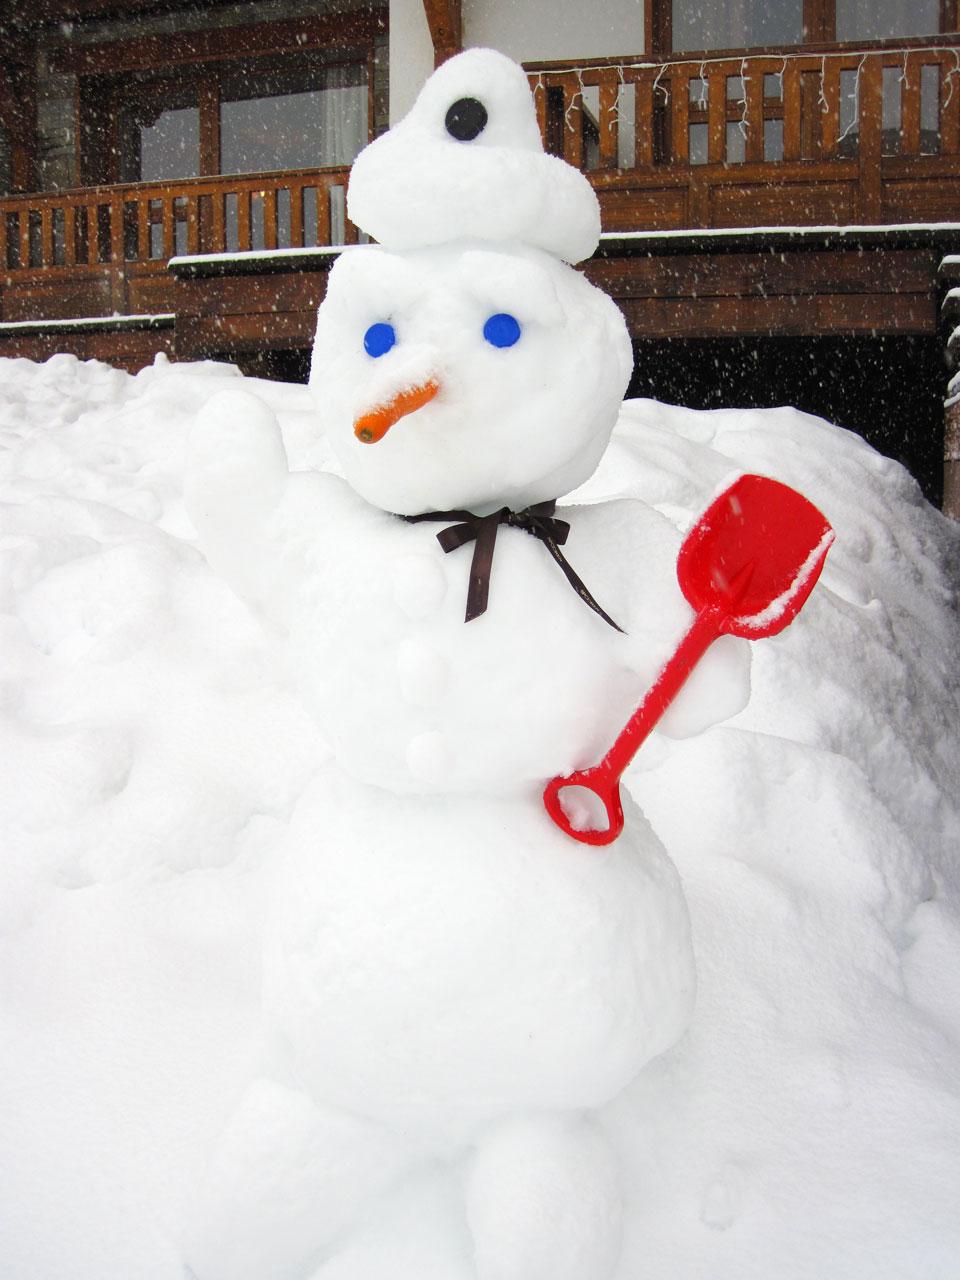 Snowman Free Stock Photo - Public Domain Pictures